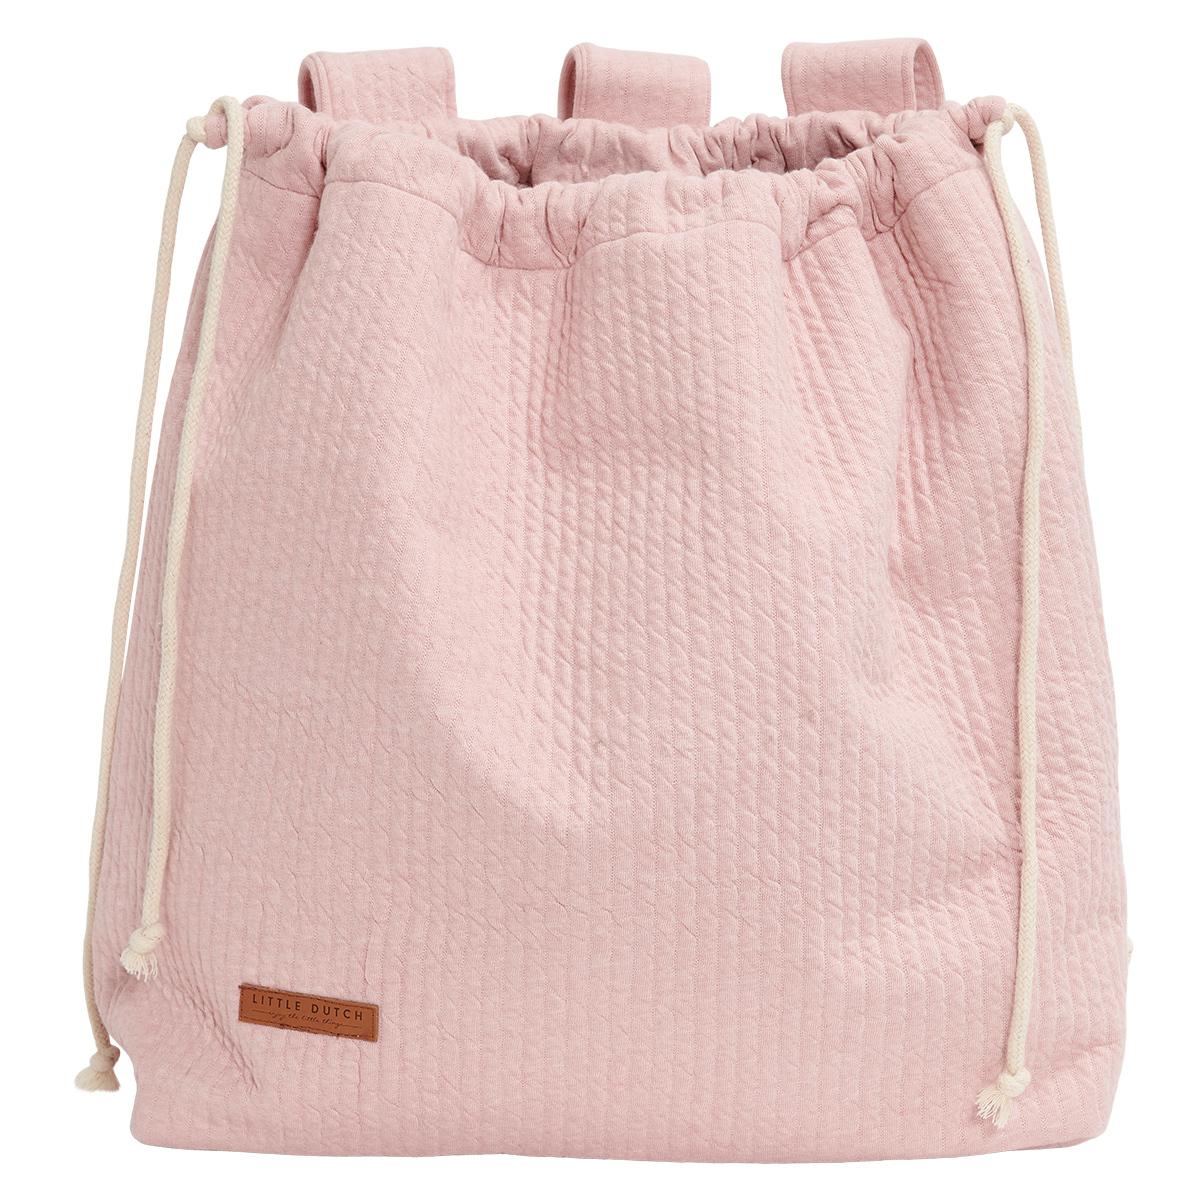 Rangement jouet Sac de Rangement Pure - Pink Sac de Rangement Pure - Pink